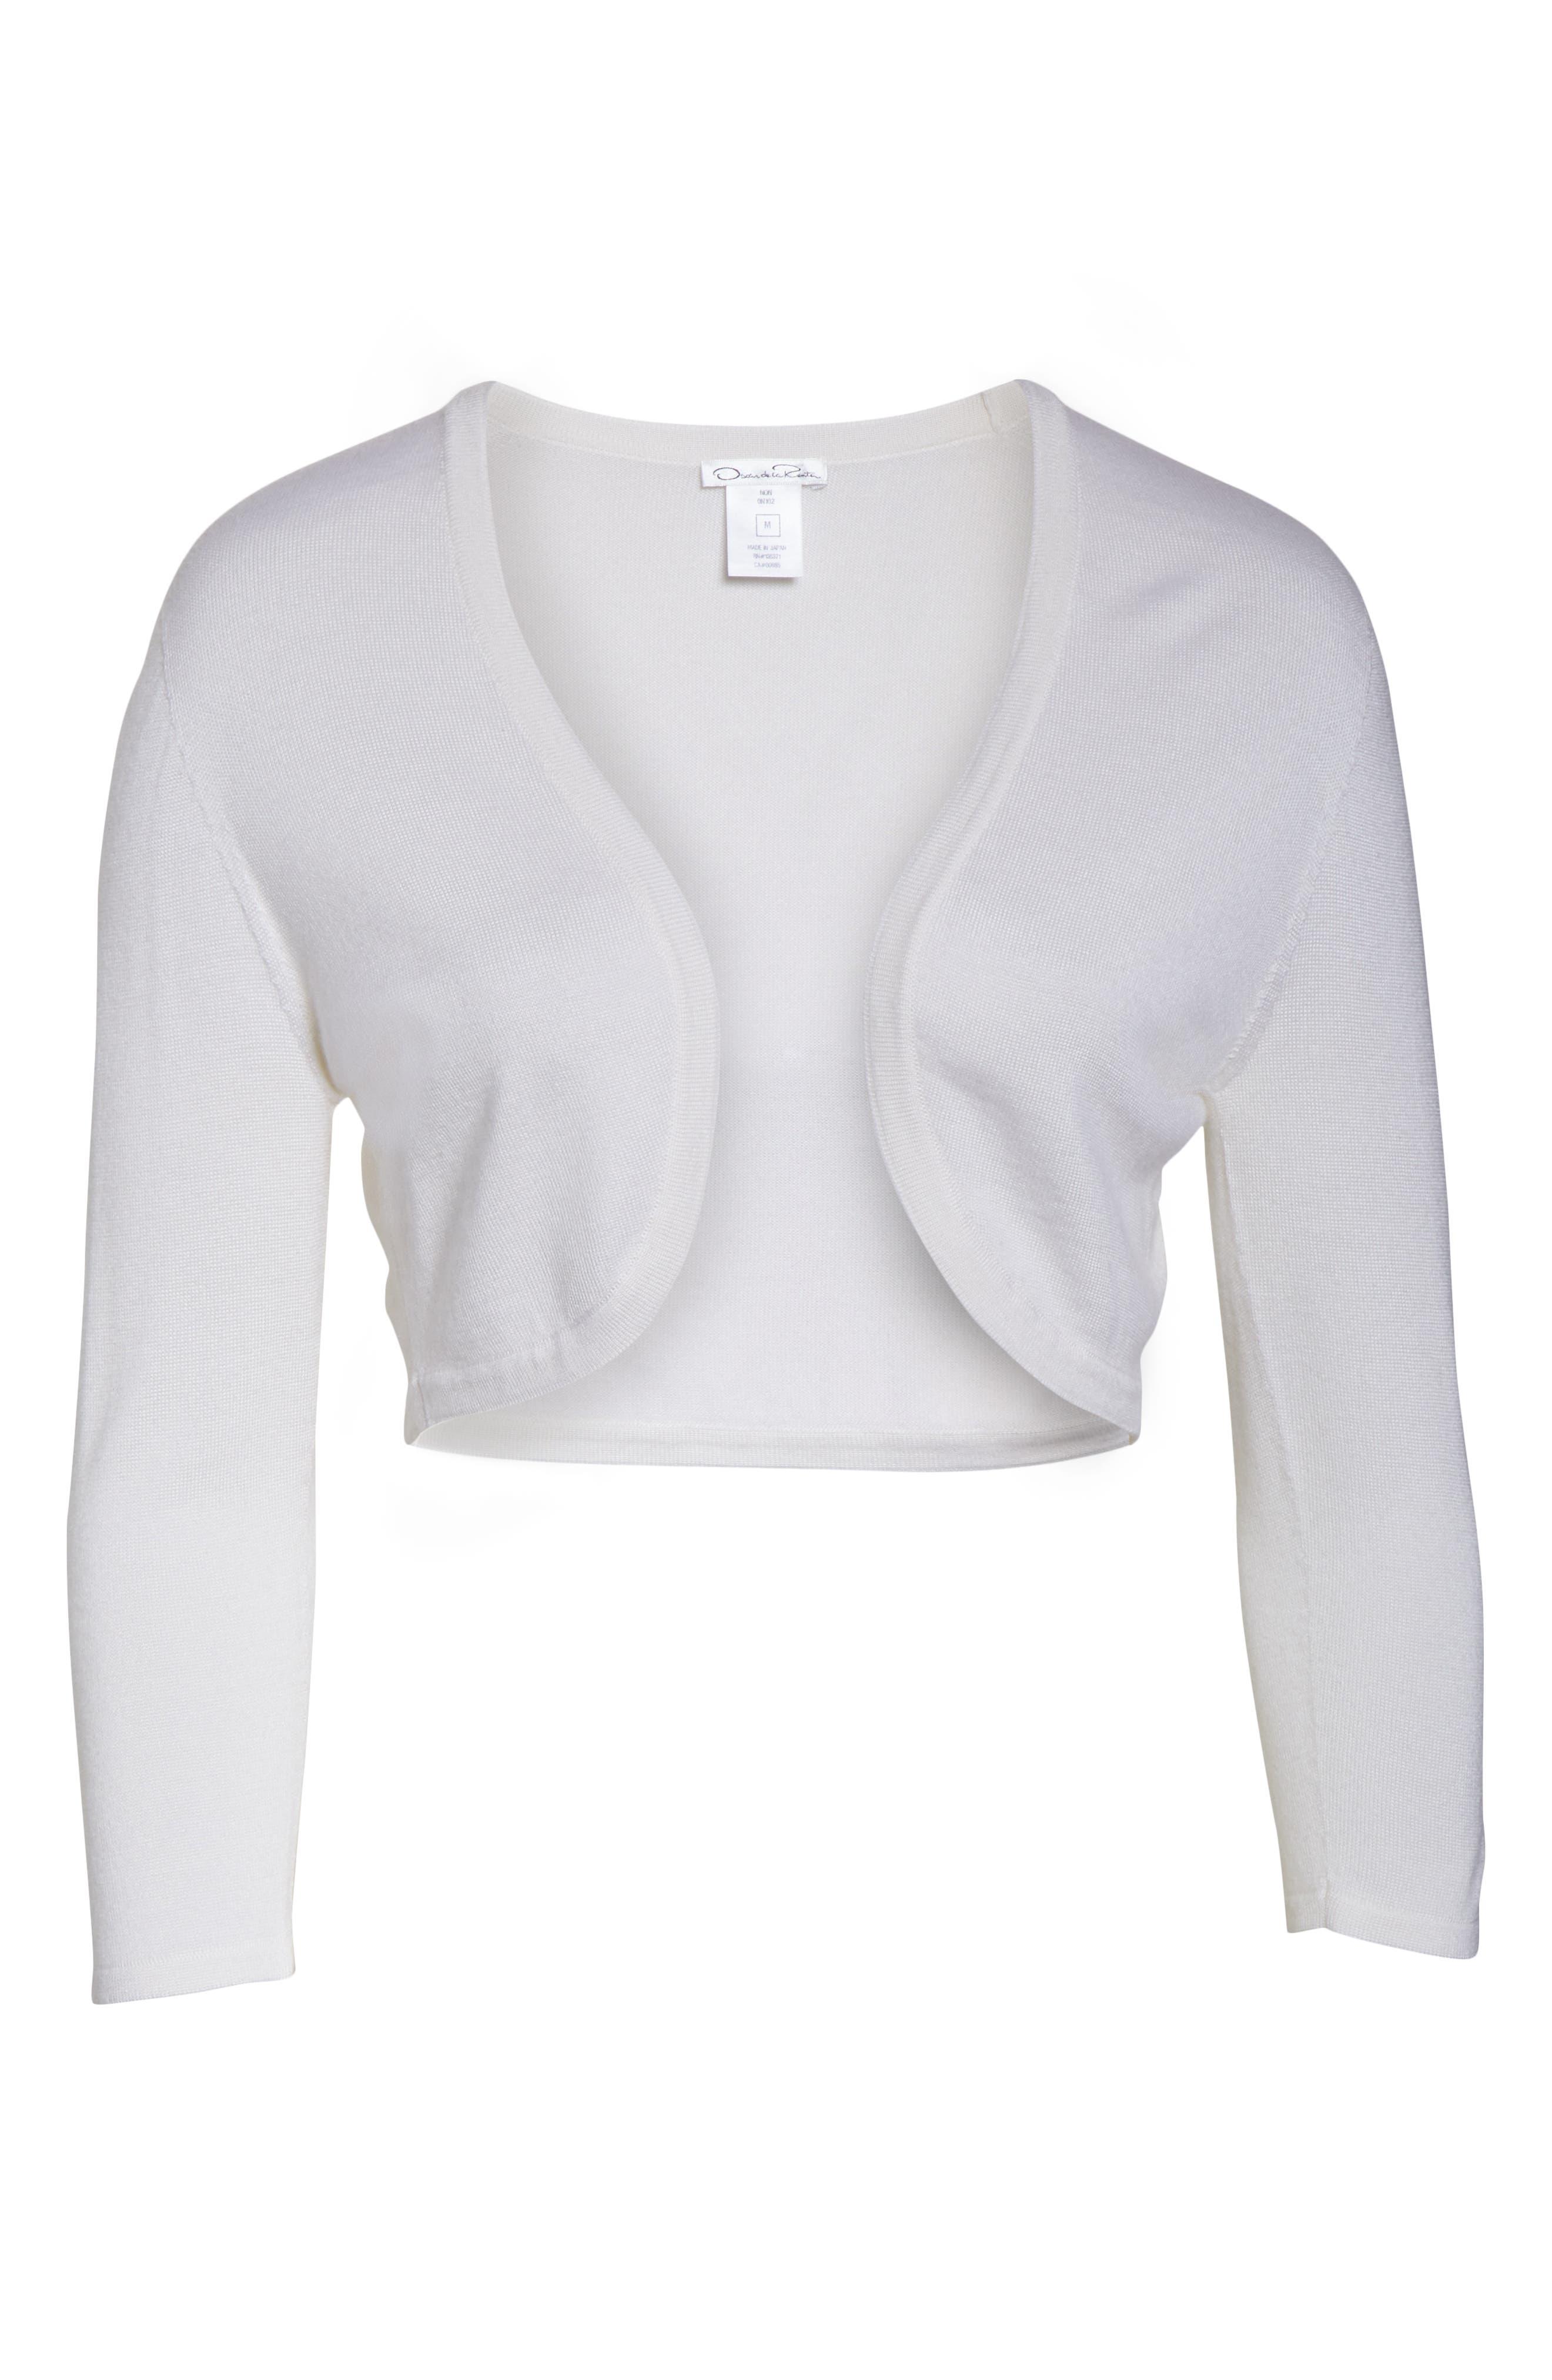 bolero jacket | Nordstrom